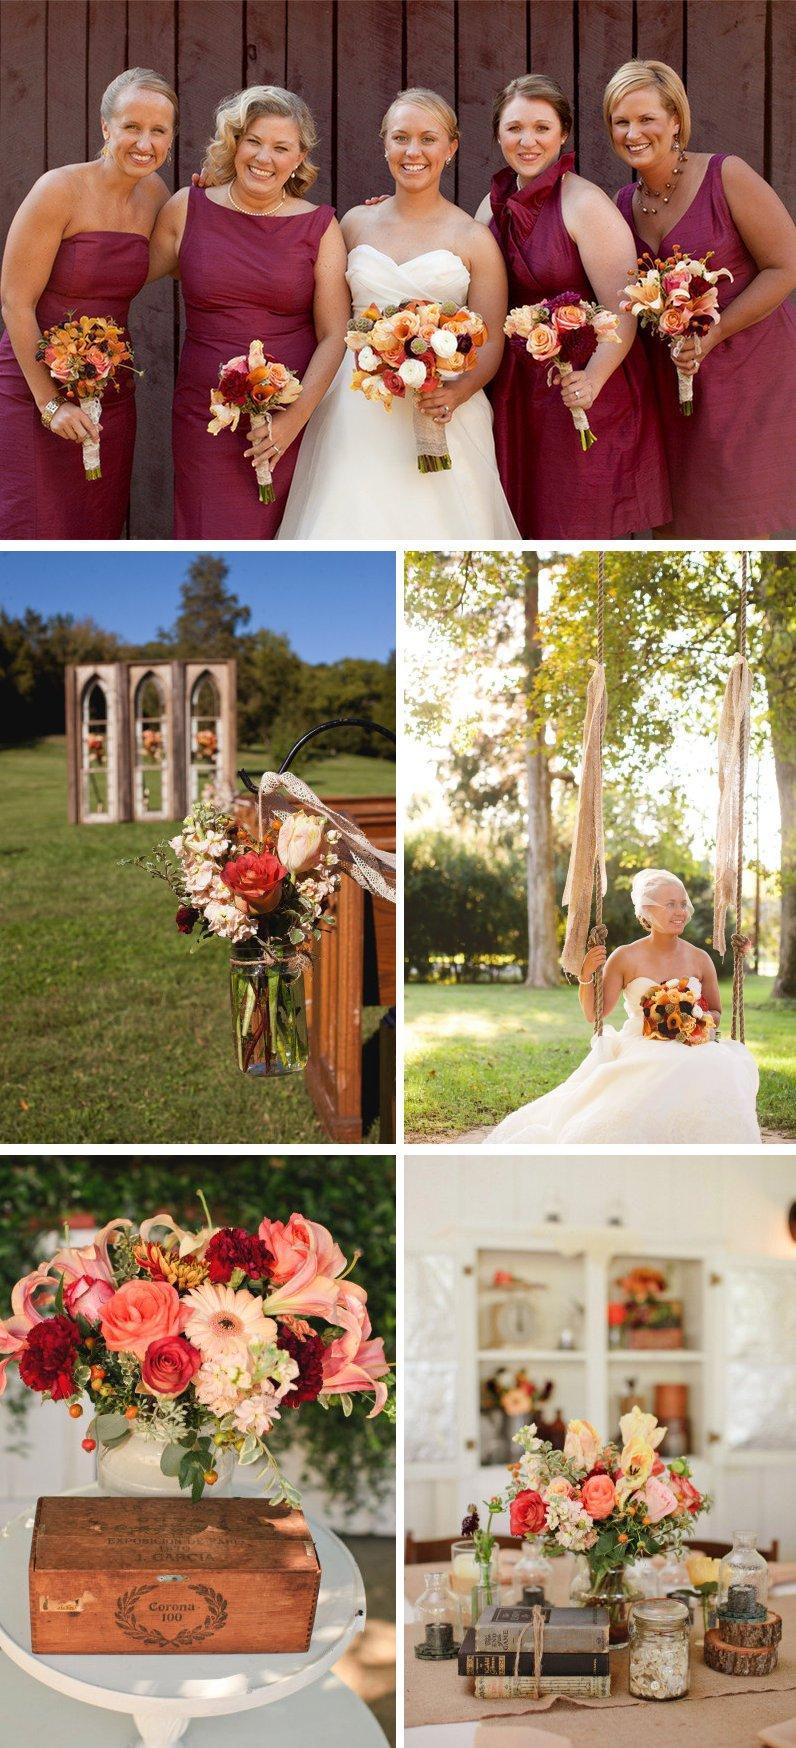 Wedding decoration wedding centerpieces outdoor theme wedding centerpieces outdoor theme outdoor country western themed wedding colorful wedding flowers junglespirit Choice Image